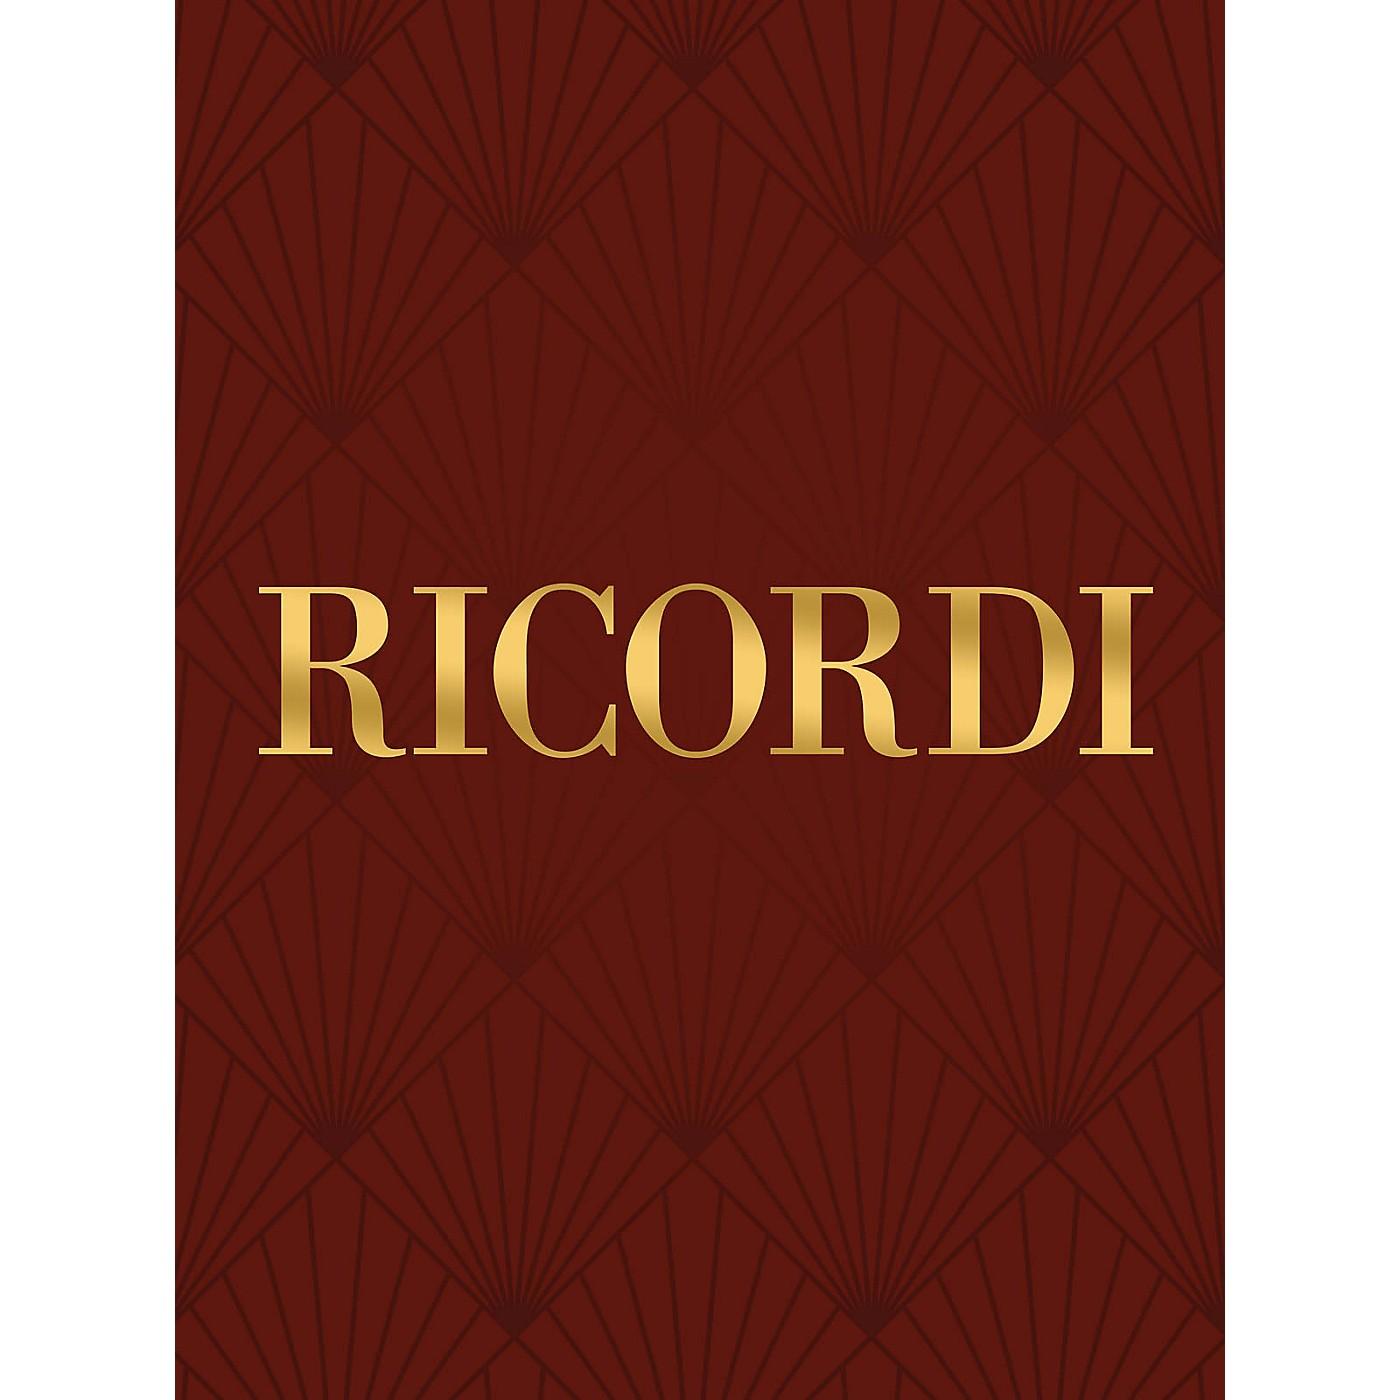 Ricordi 3 Scozzesi Op. 72, No. 3 Piano Solo Series Composed by Frederic Chopin Edited by Attilio Brugnoli thumbnail